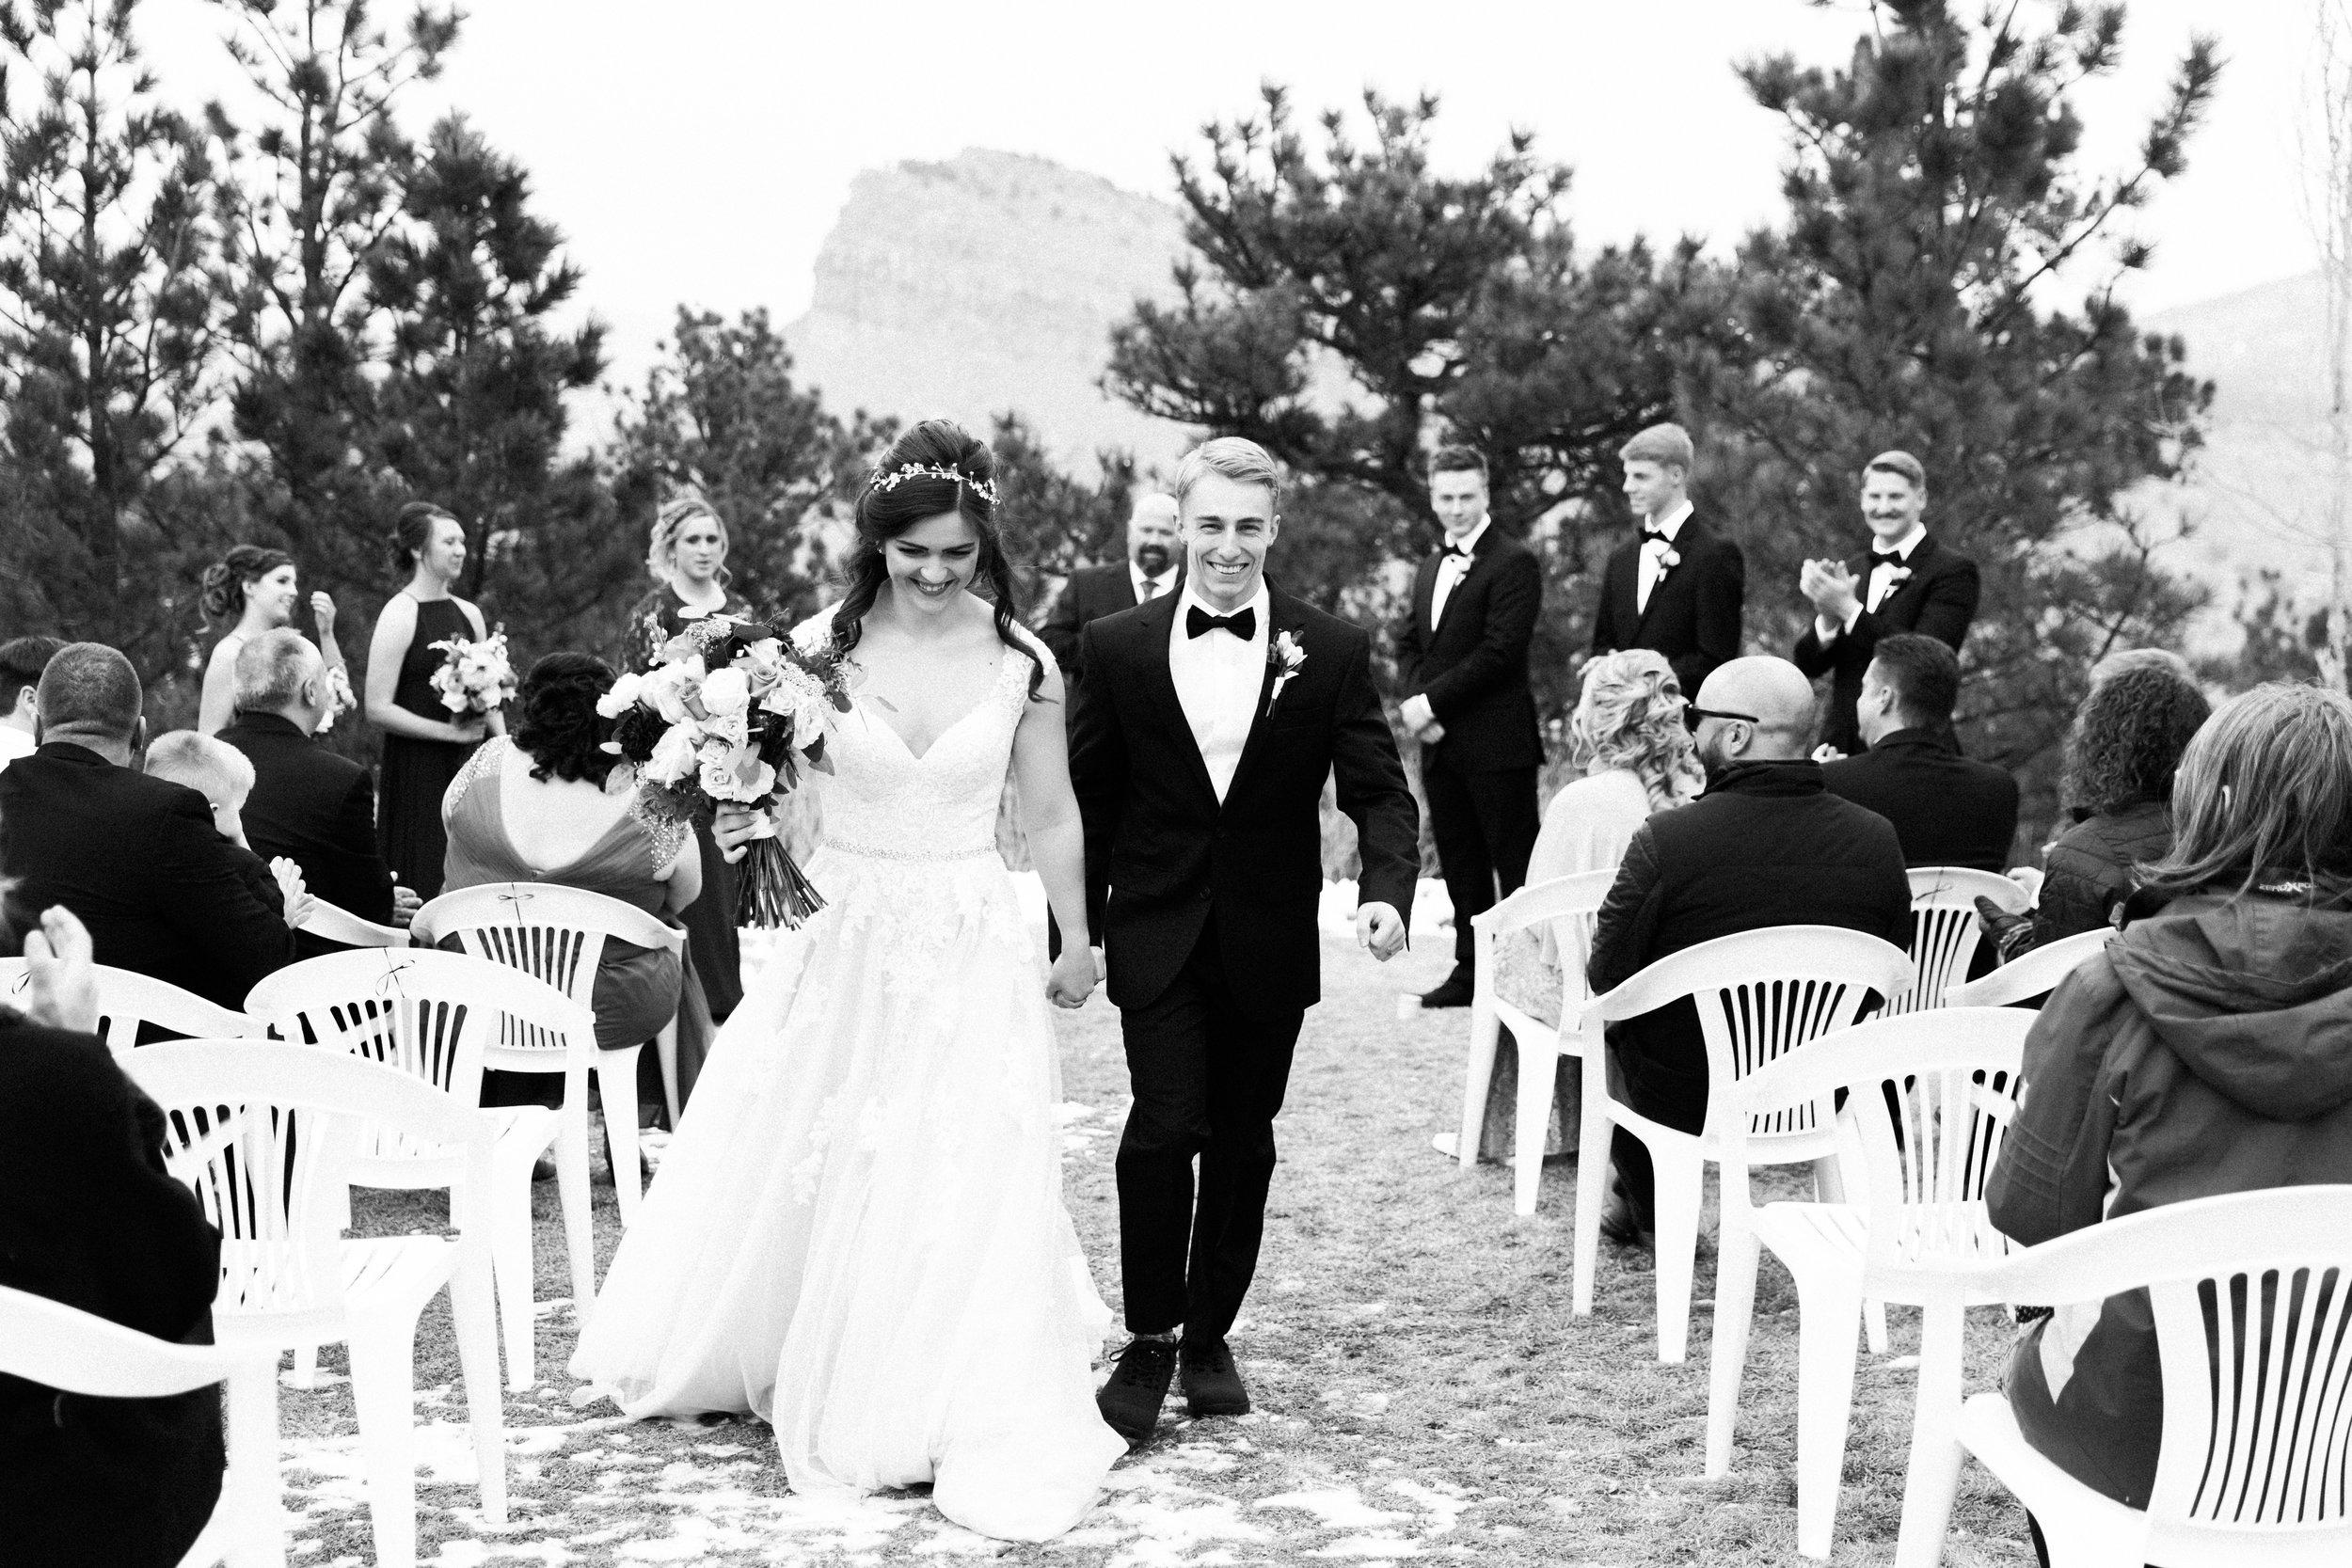 romanticcoloradodestinationwedding-33.jpg